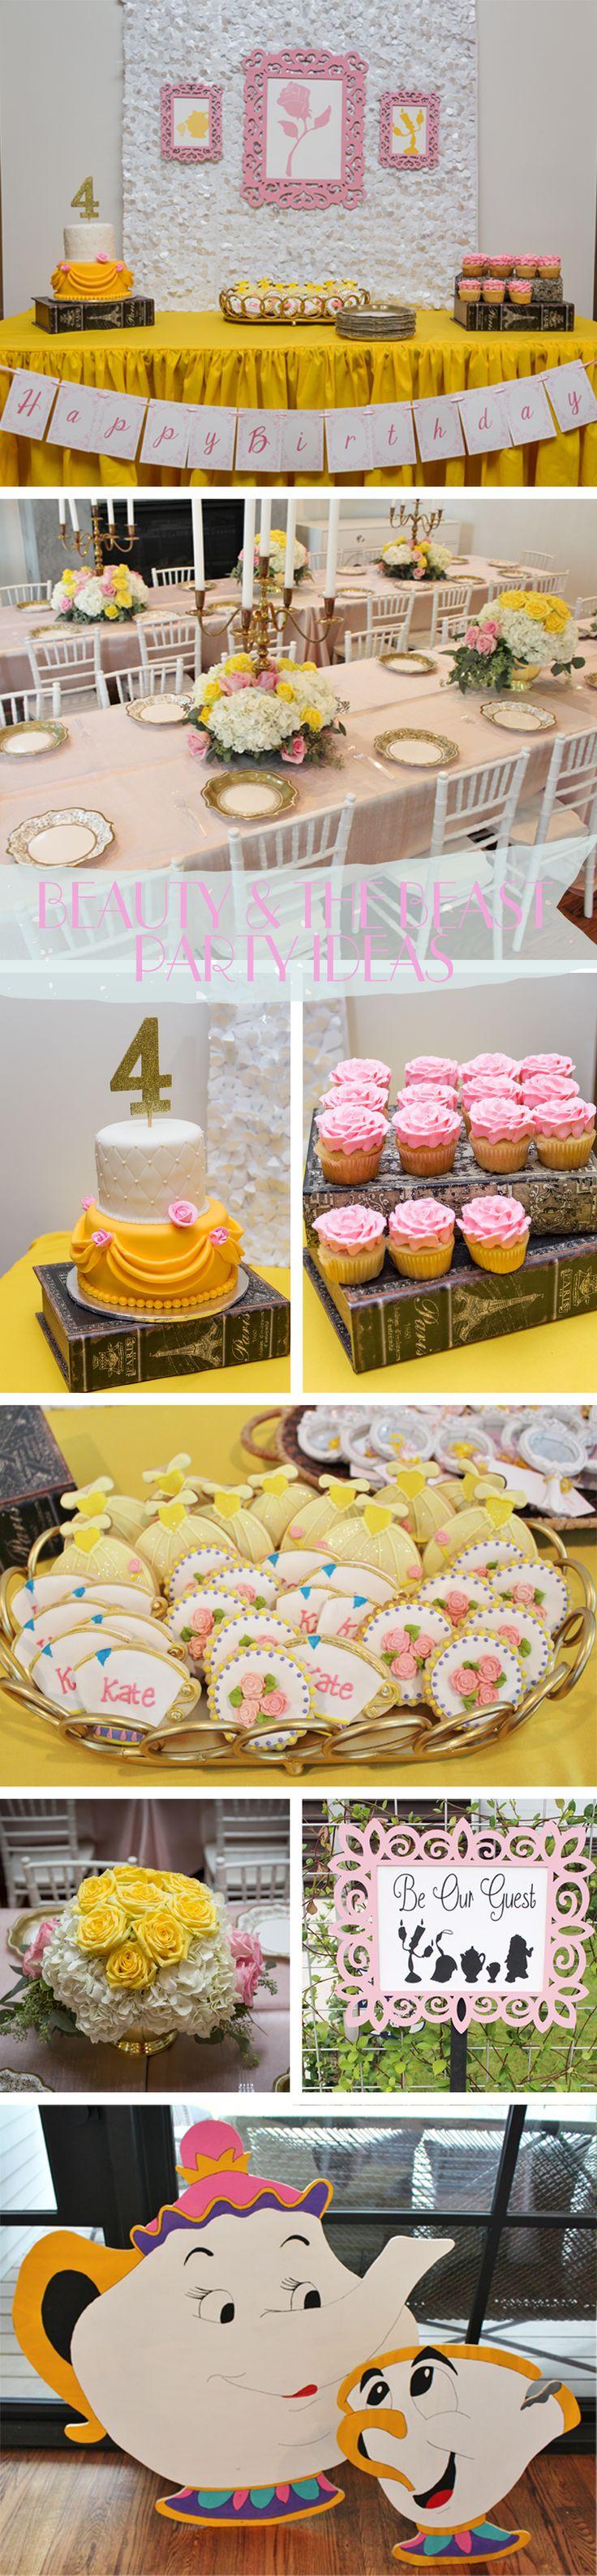 367 best Bella\'s Royal Tea Party images on Pinterest | Dj, Treats ...